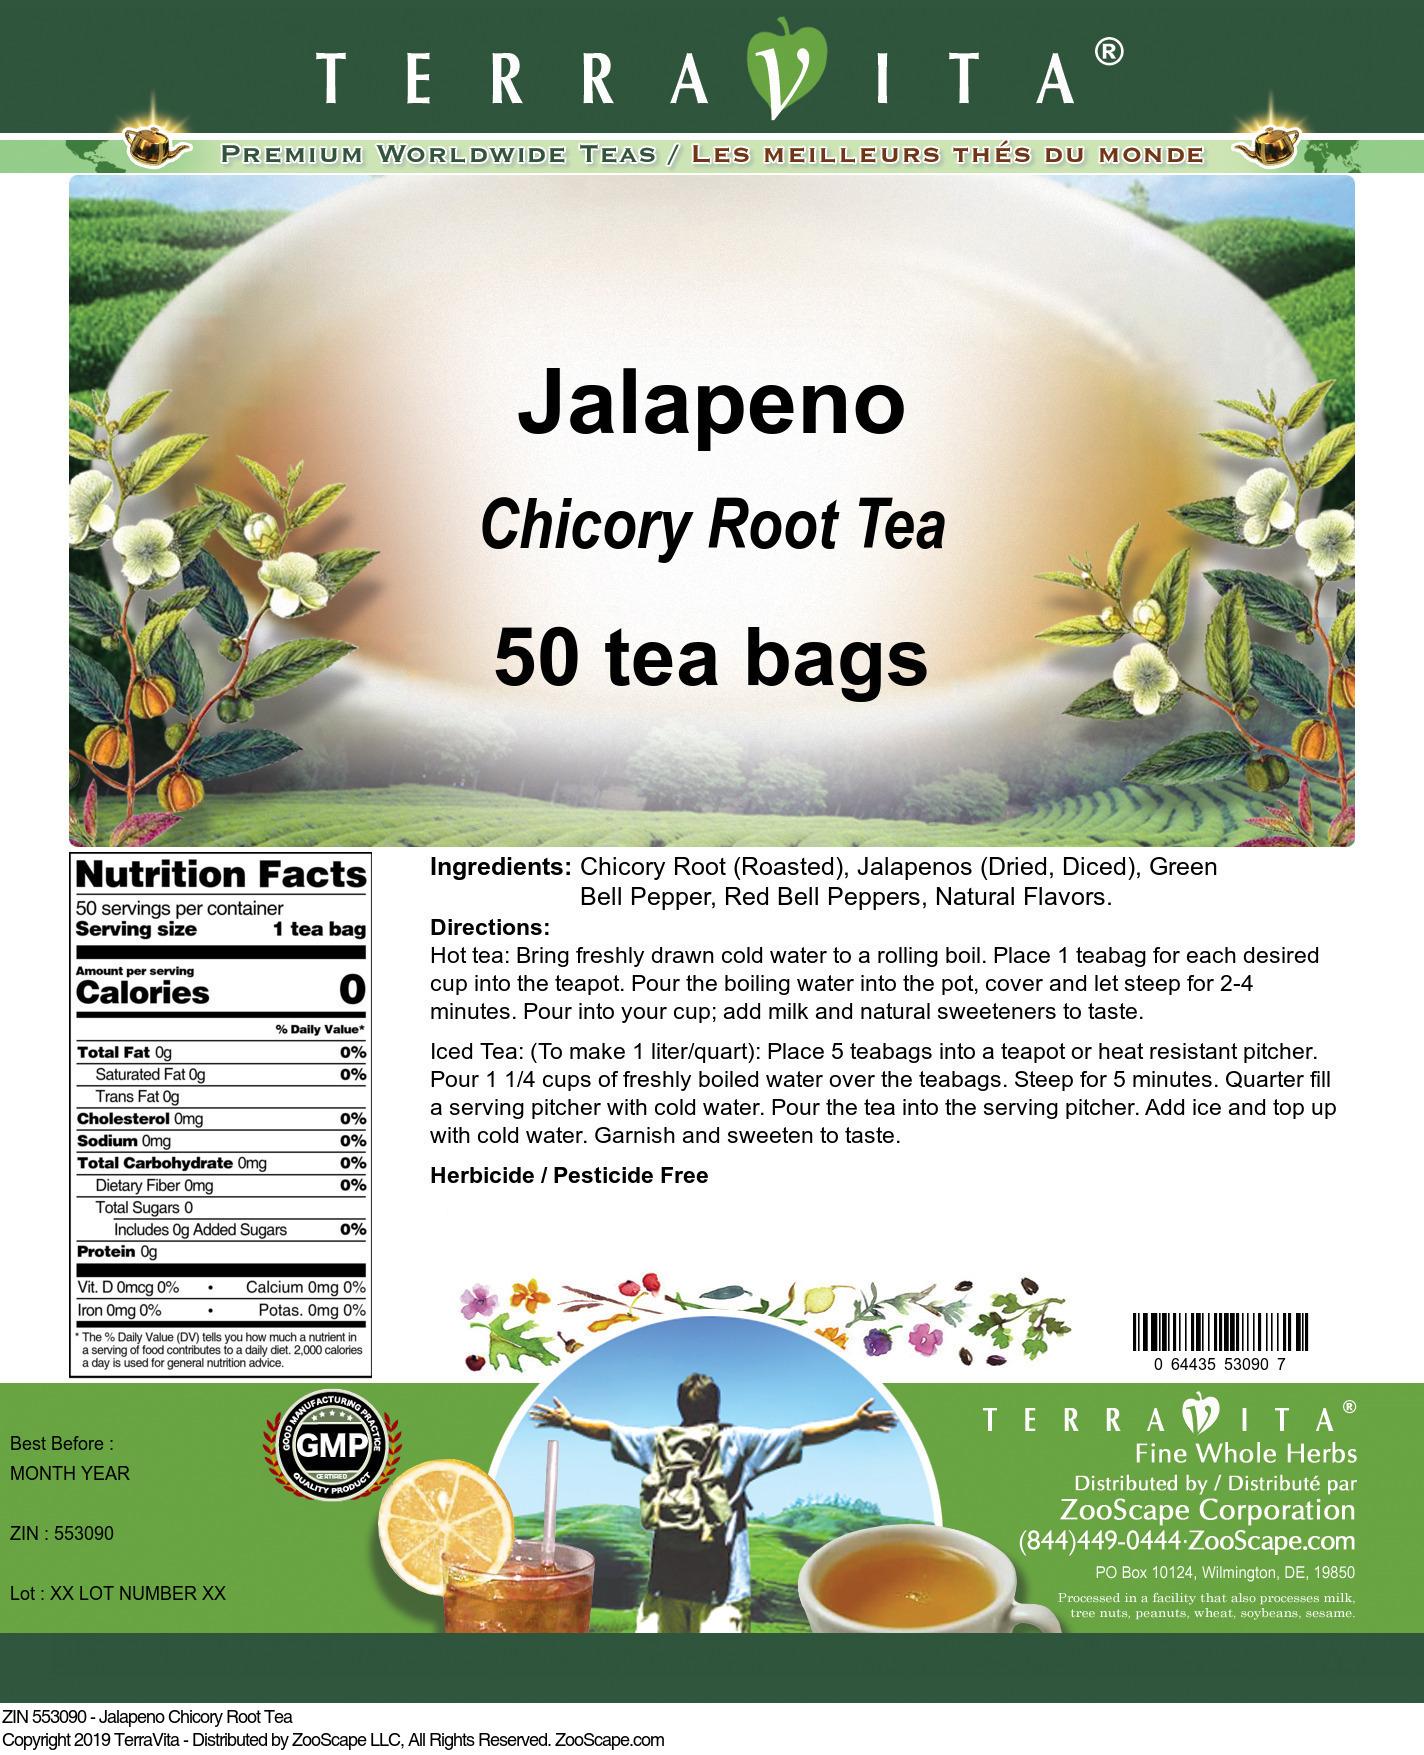 Jalapeno Chicory Root Tea